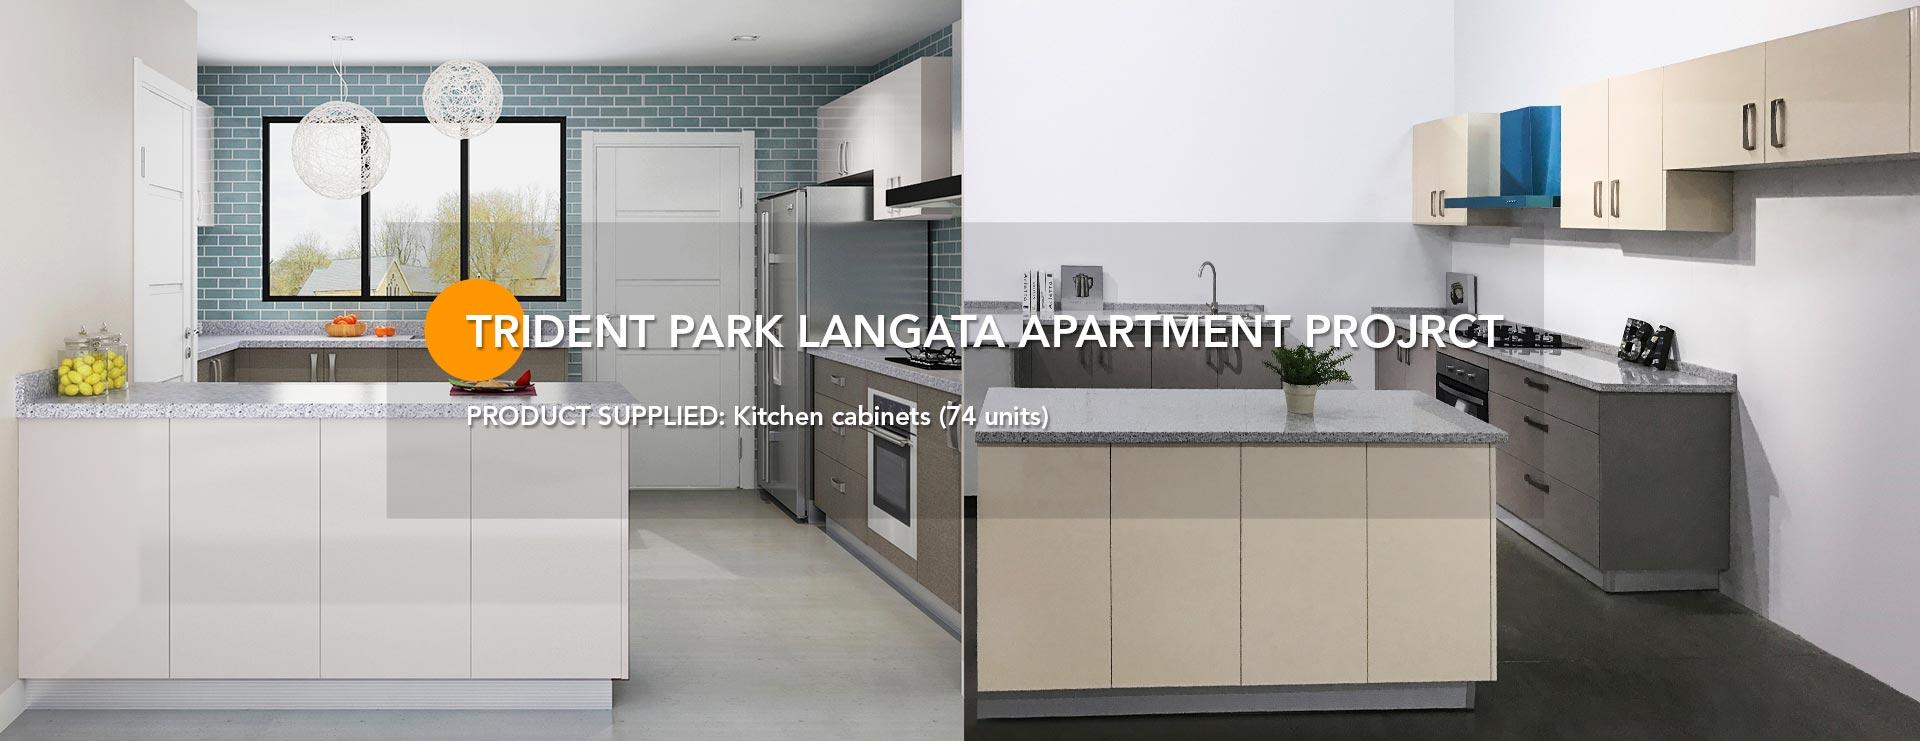 Trident-Park-Langata-Apartment-Nairobi (1)